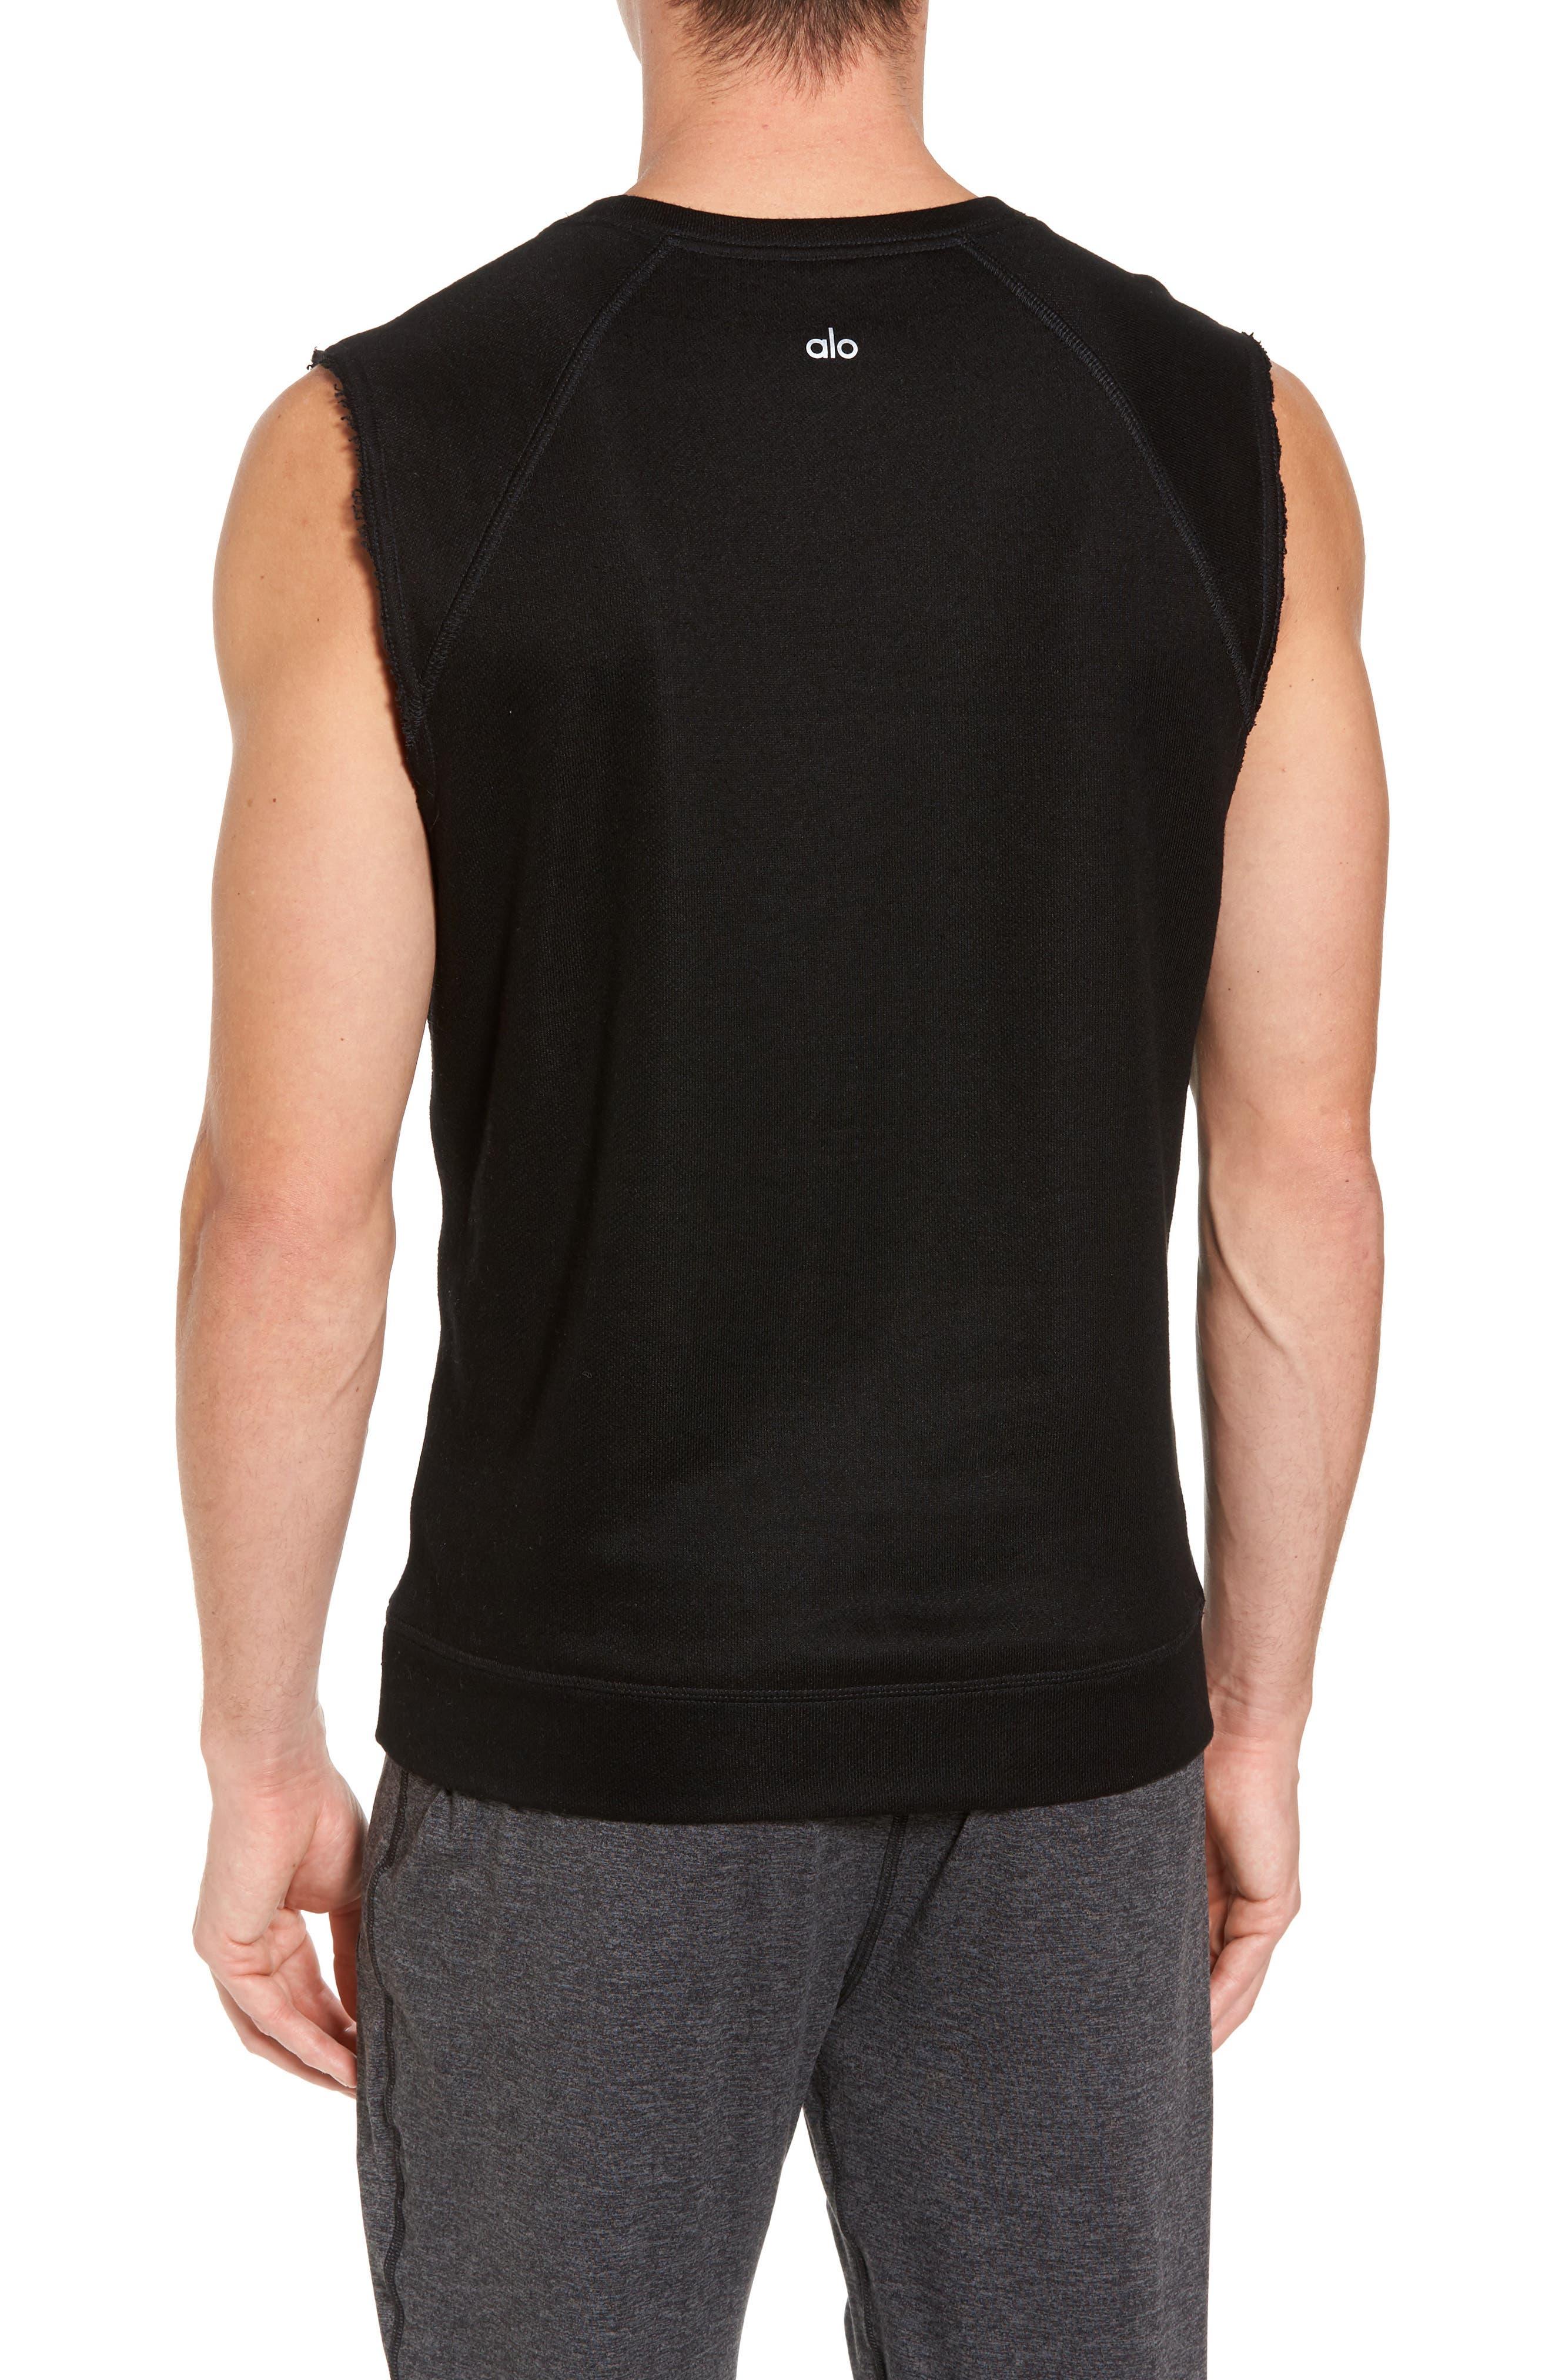 ALO, Dosha Relaxed Fit Sweatshirt Tank, Alternate thumbnail 2, color, BLACK